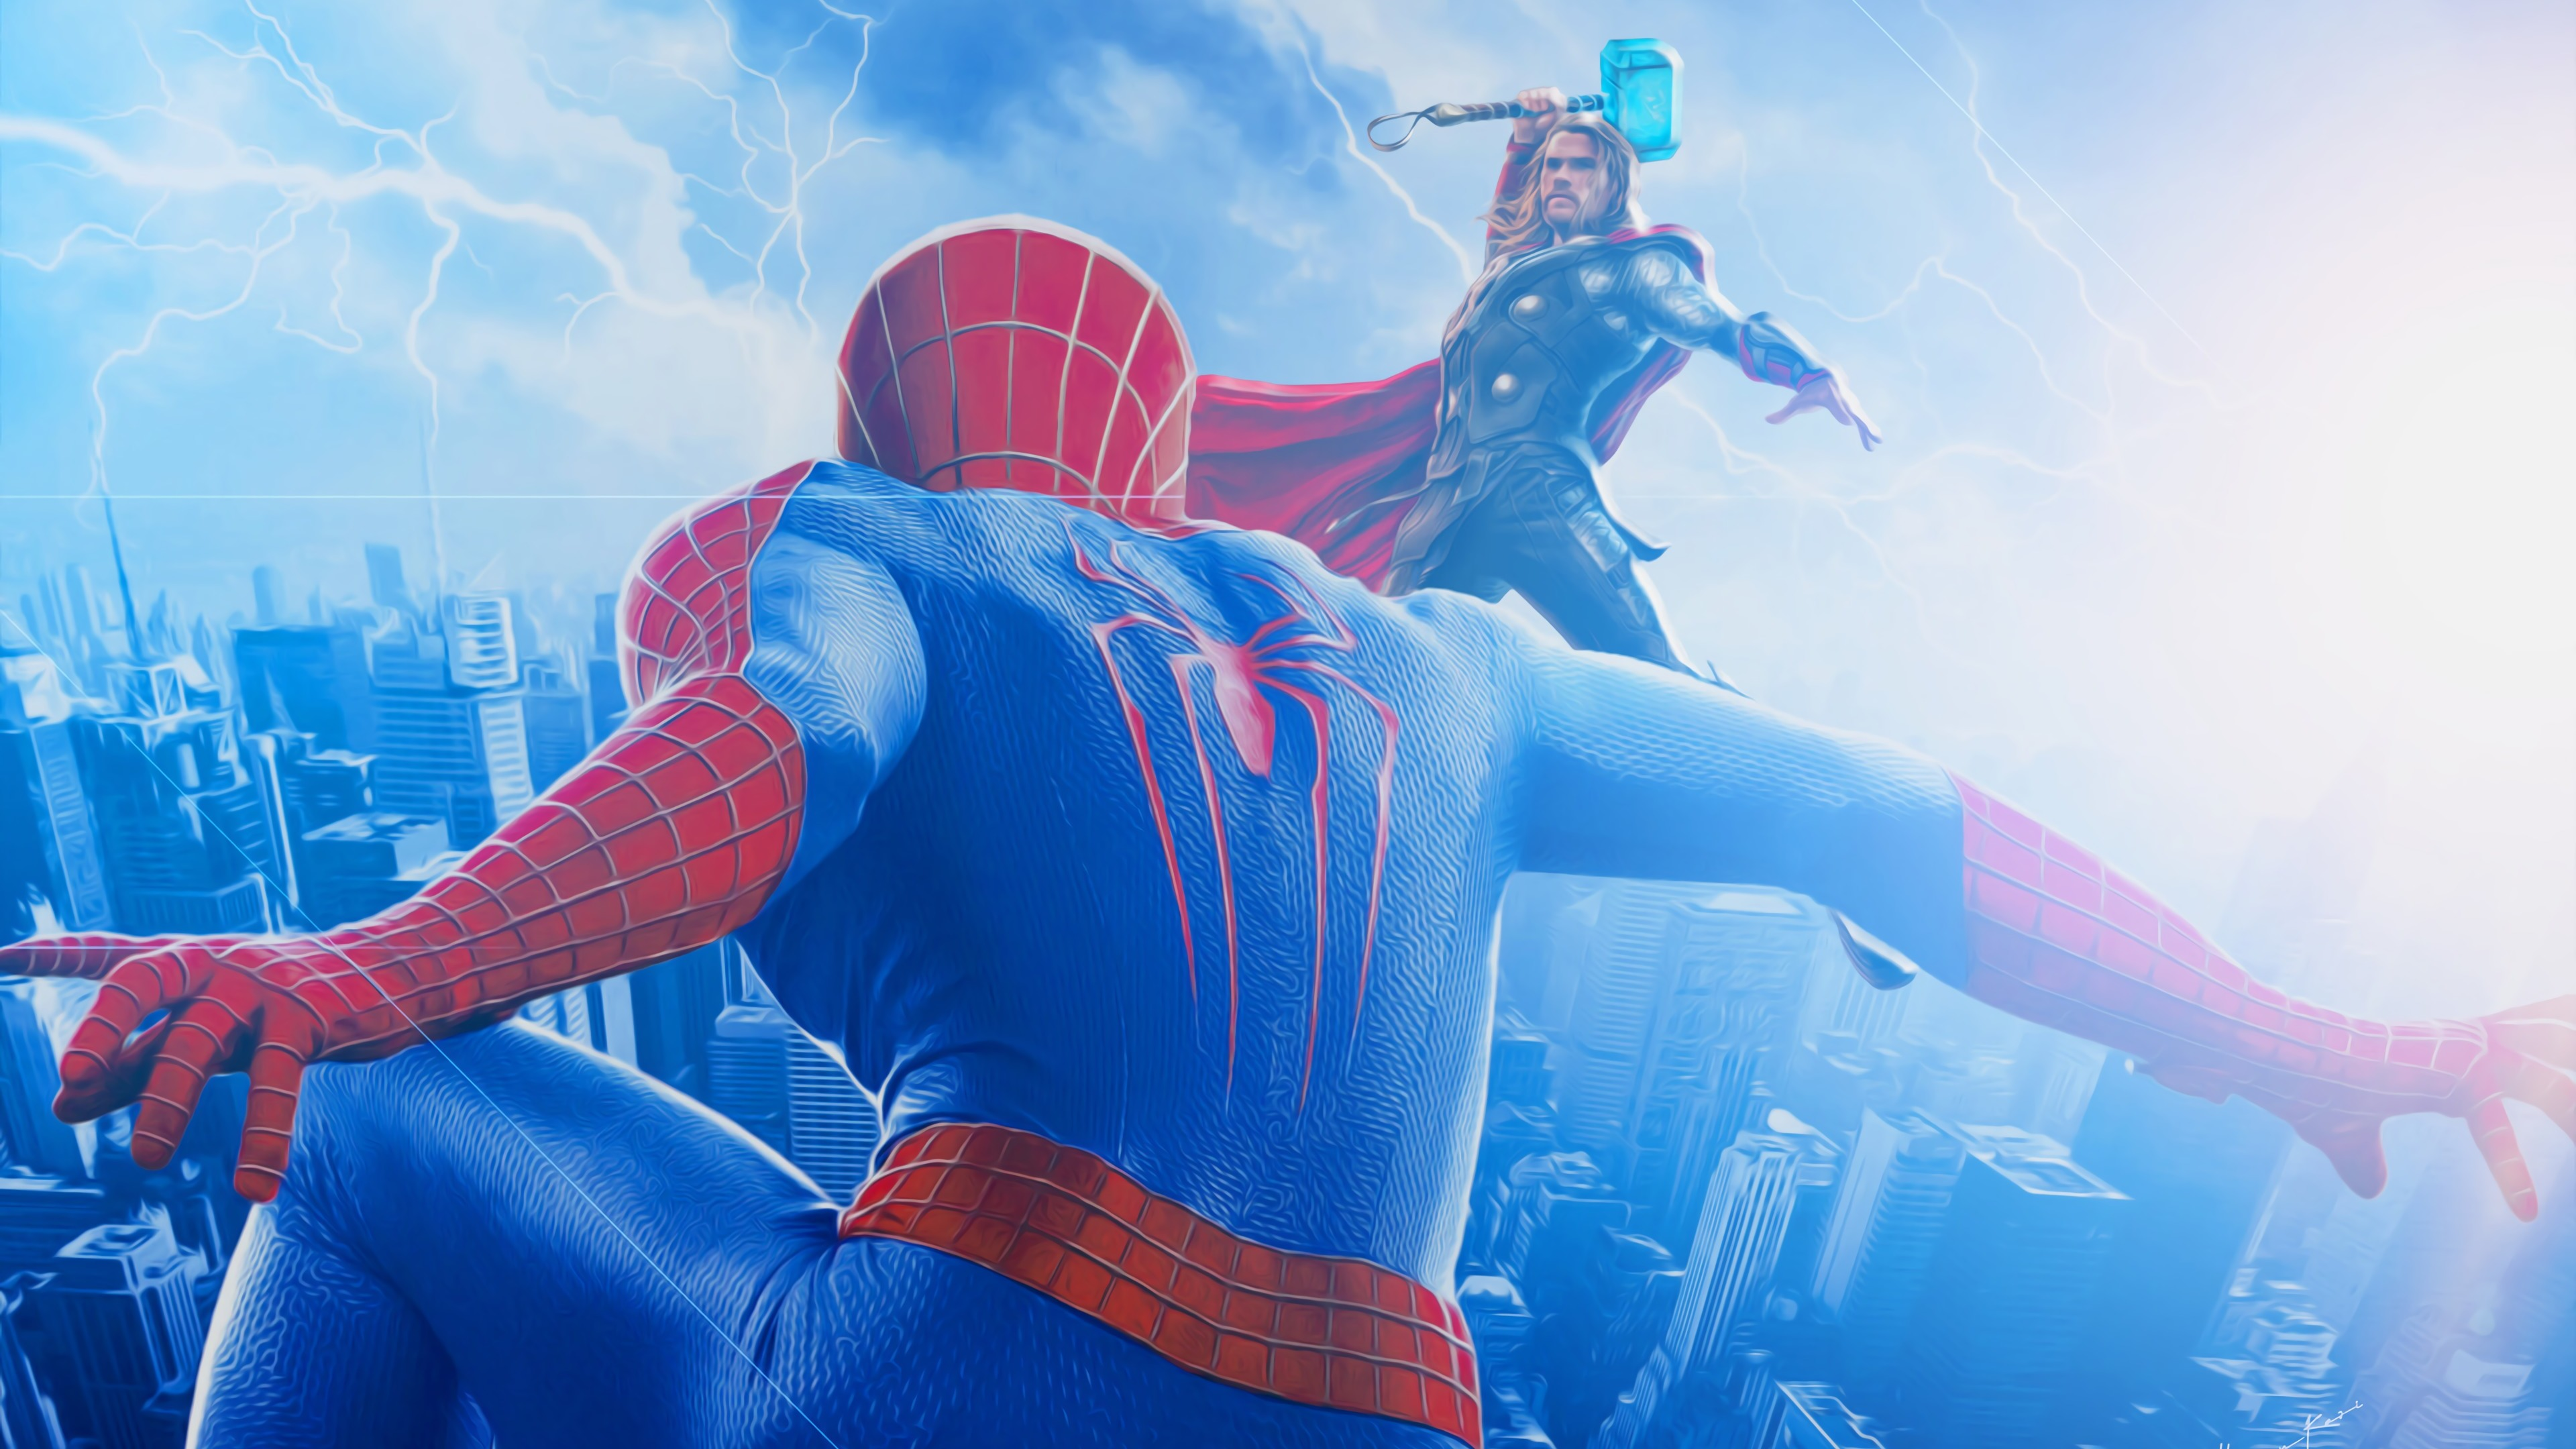 spiderman vs thor 1568055133 - Spiderman Vs Thor - thor wallpapers, superheroes wallpapers, spiderman wallpapers, hd-wallpapers, digital art wallpapers, artwork wallpapers, artstation wallpapers, art wallpapers, 4k-wallpapers